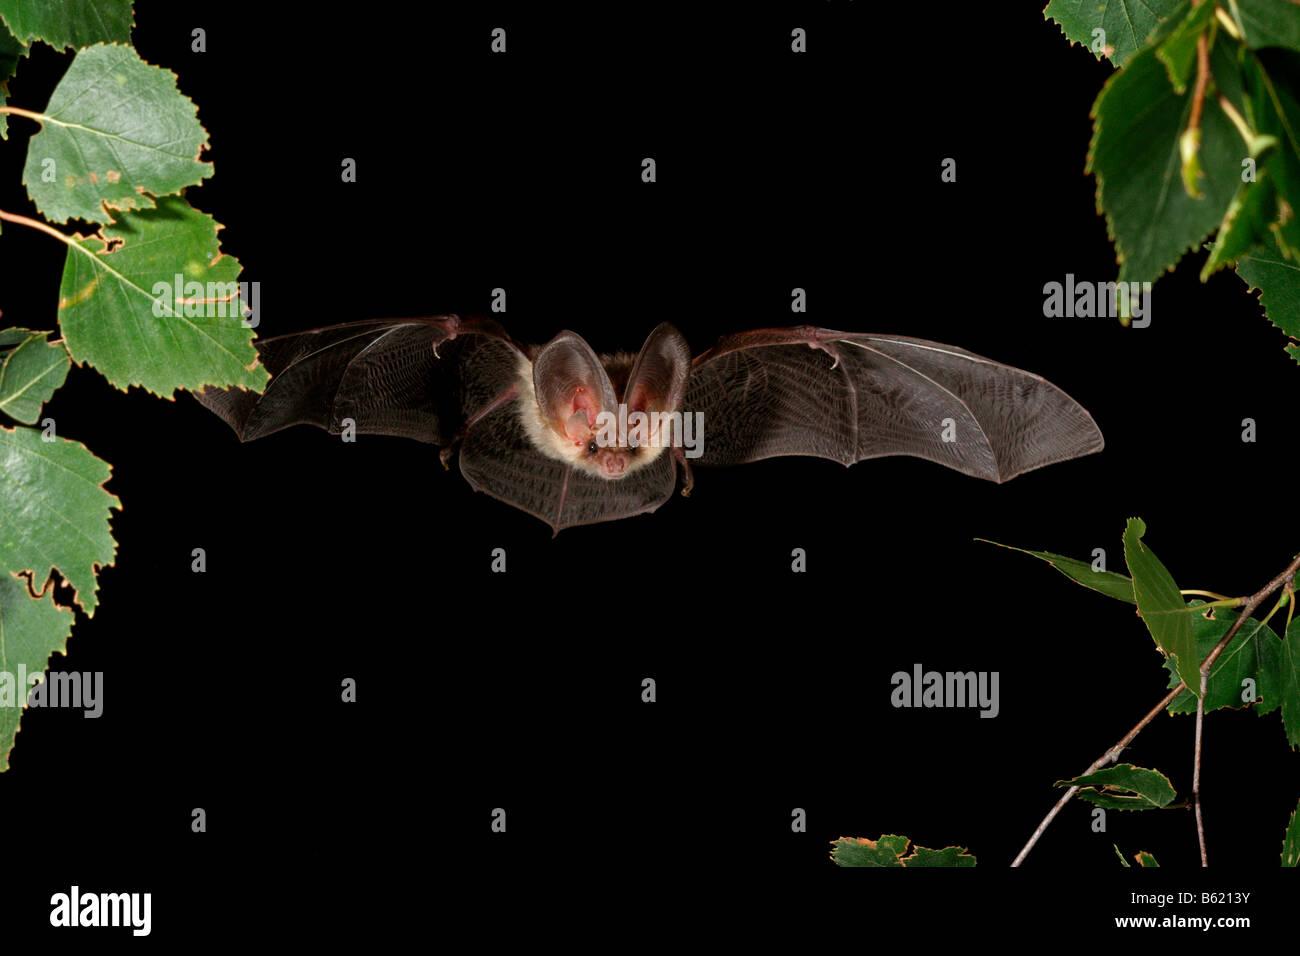 Braun langohrige Fledermaus oder gemeinsame lange Schmuckschildkröte Bat (Langohrfledermäuse Auritus) Stockbild